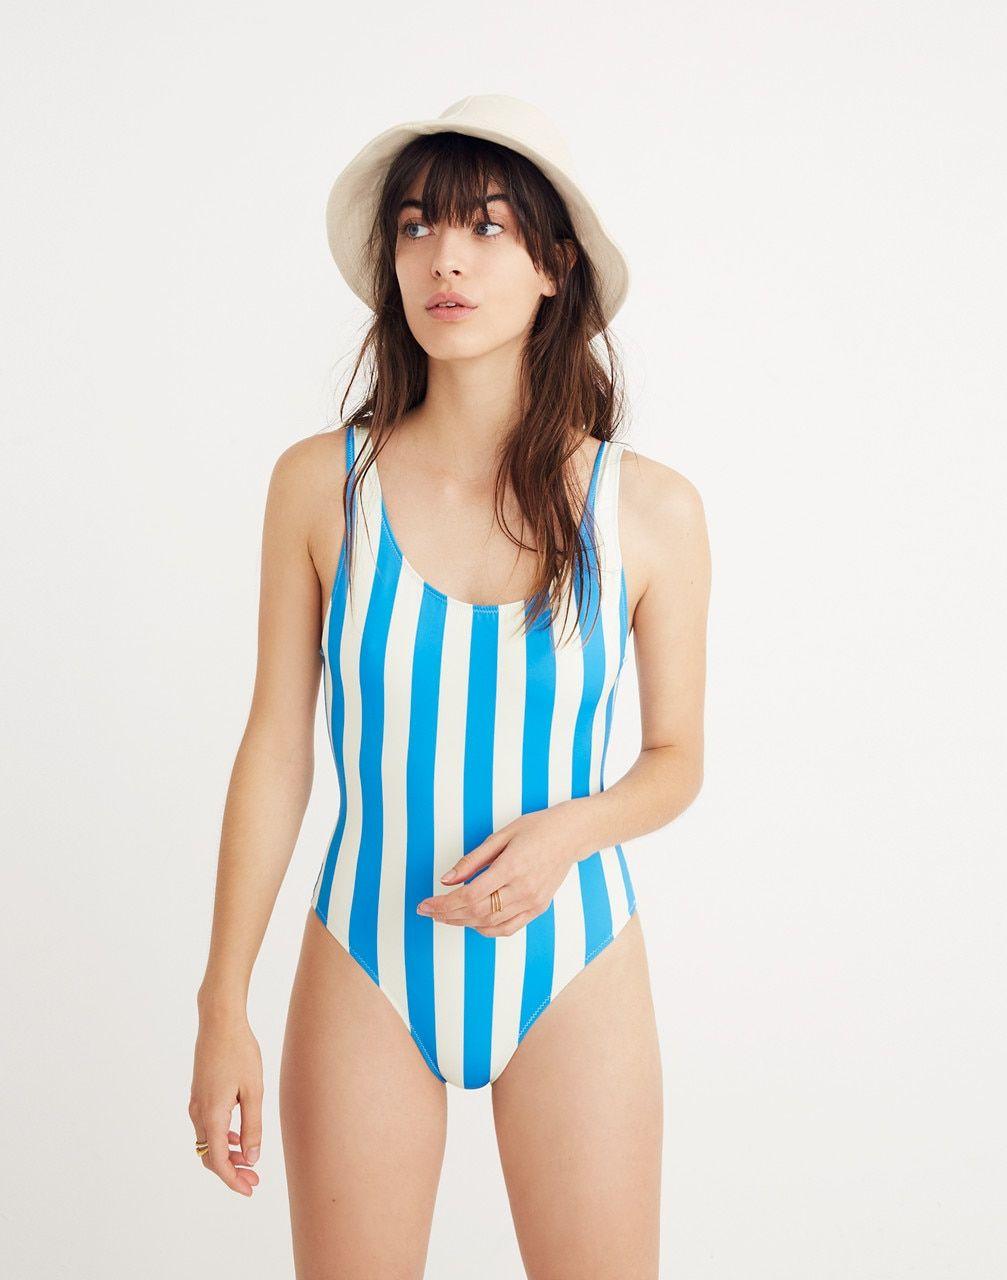 ff2970c3527a7 Solid & Striped® Anne-Marie One-Piece Swimsuit in Sea Stripe in sea stripe